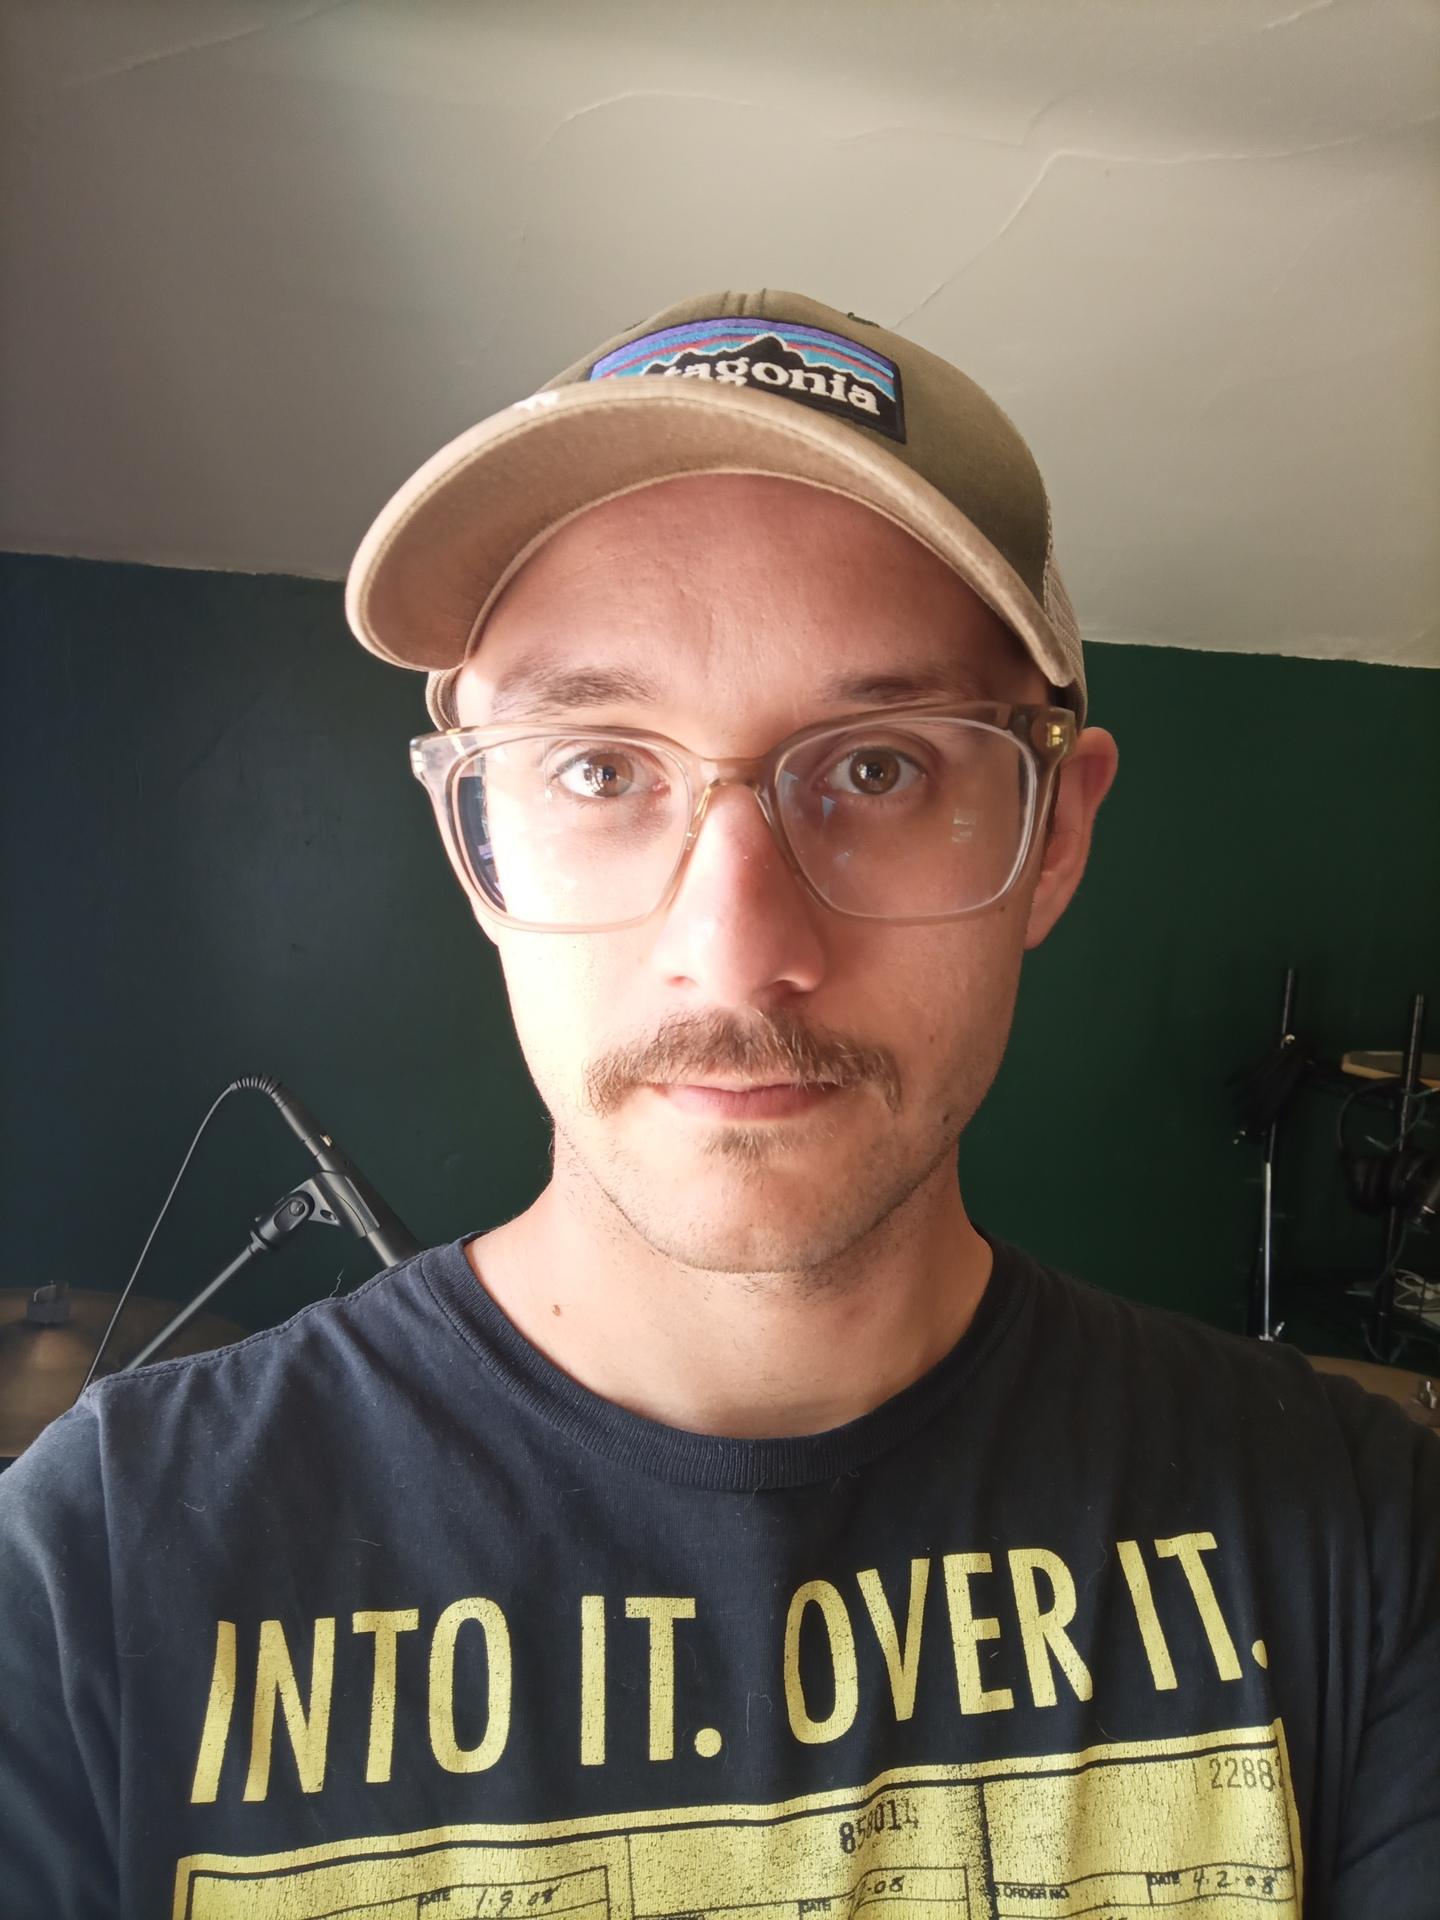 blu g90 pro review selfie camera sample